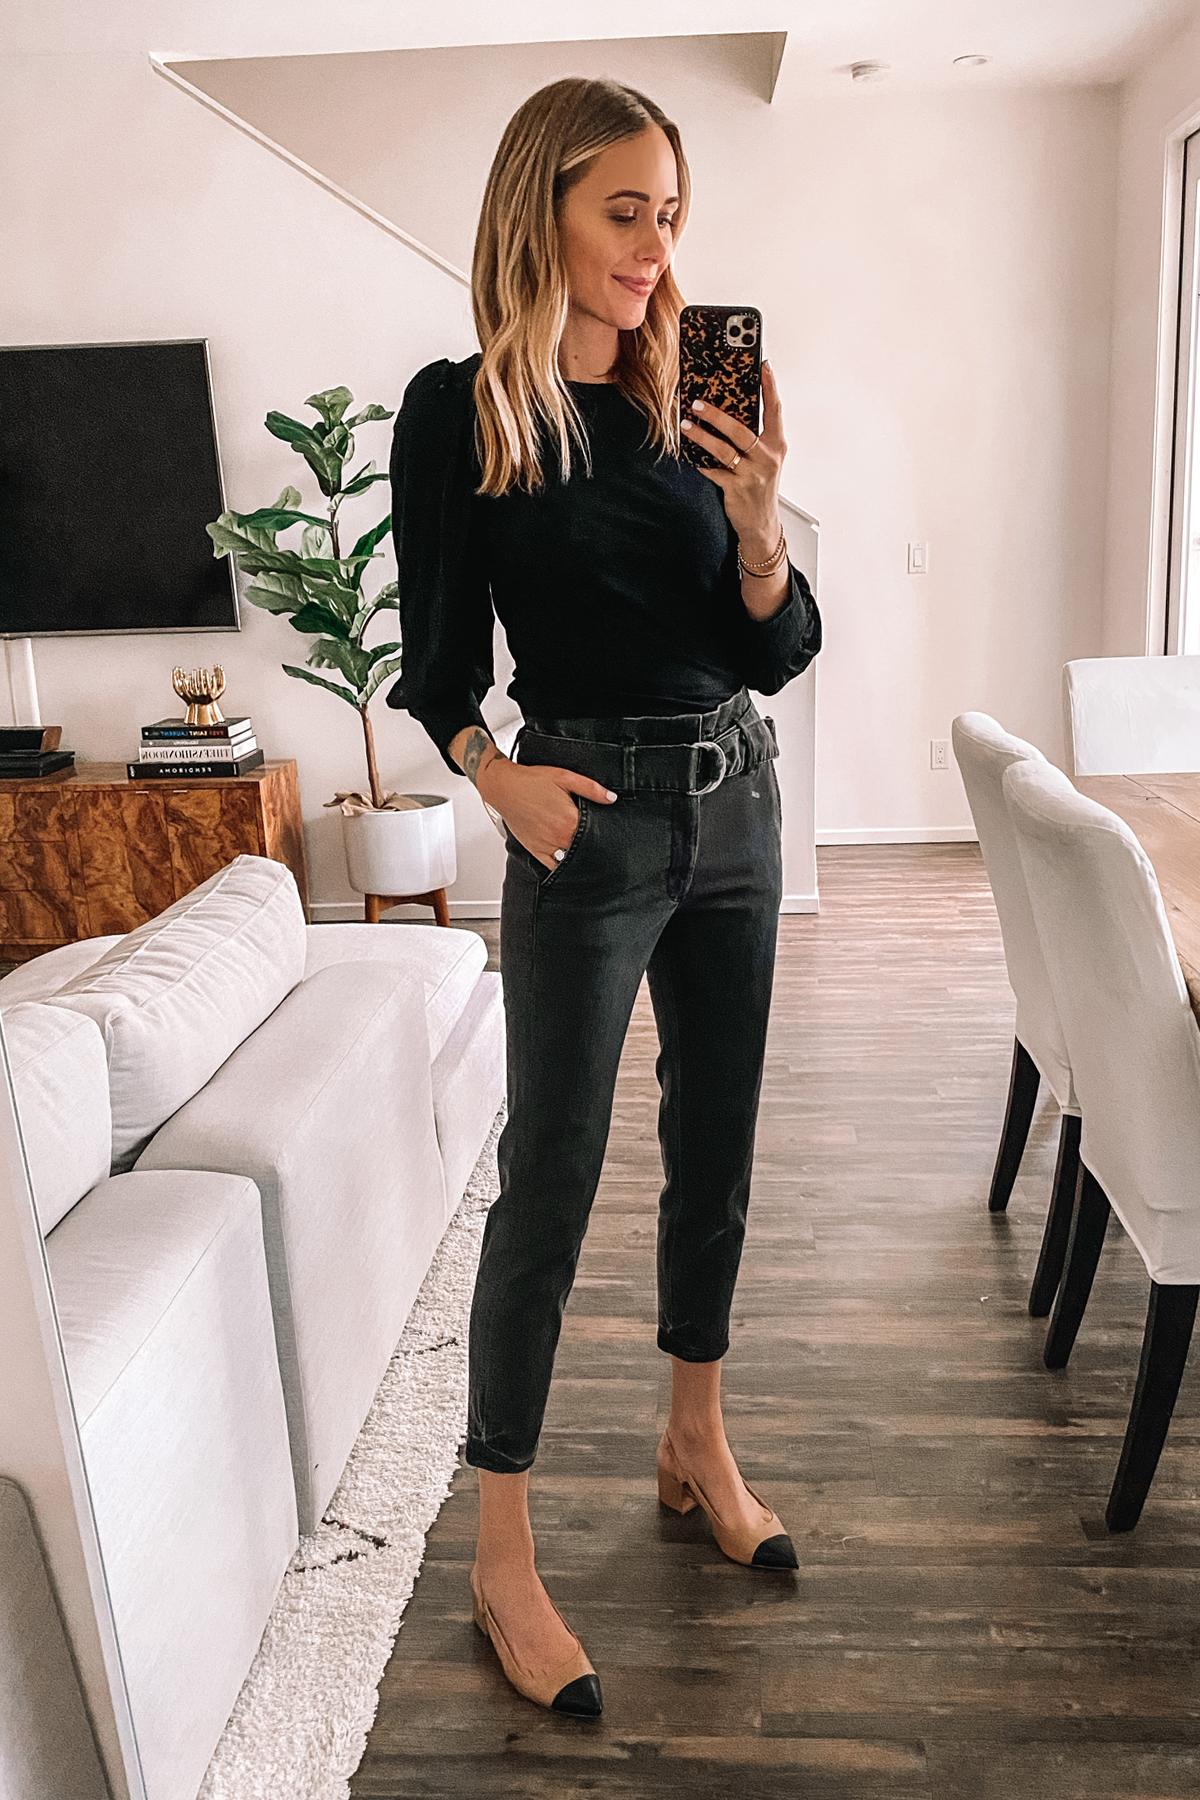 Fashion Jackson Wearing Black Knit Top Grey Paperbag Waist Jeans Slingbacks Express Haul